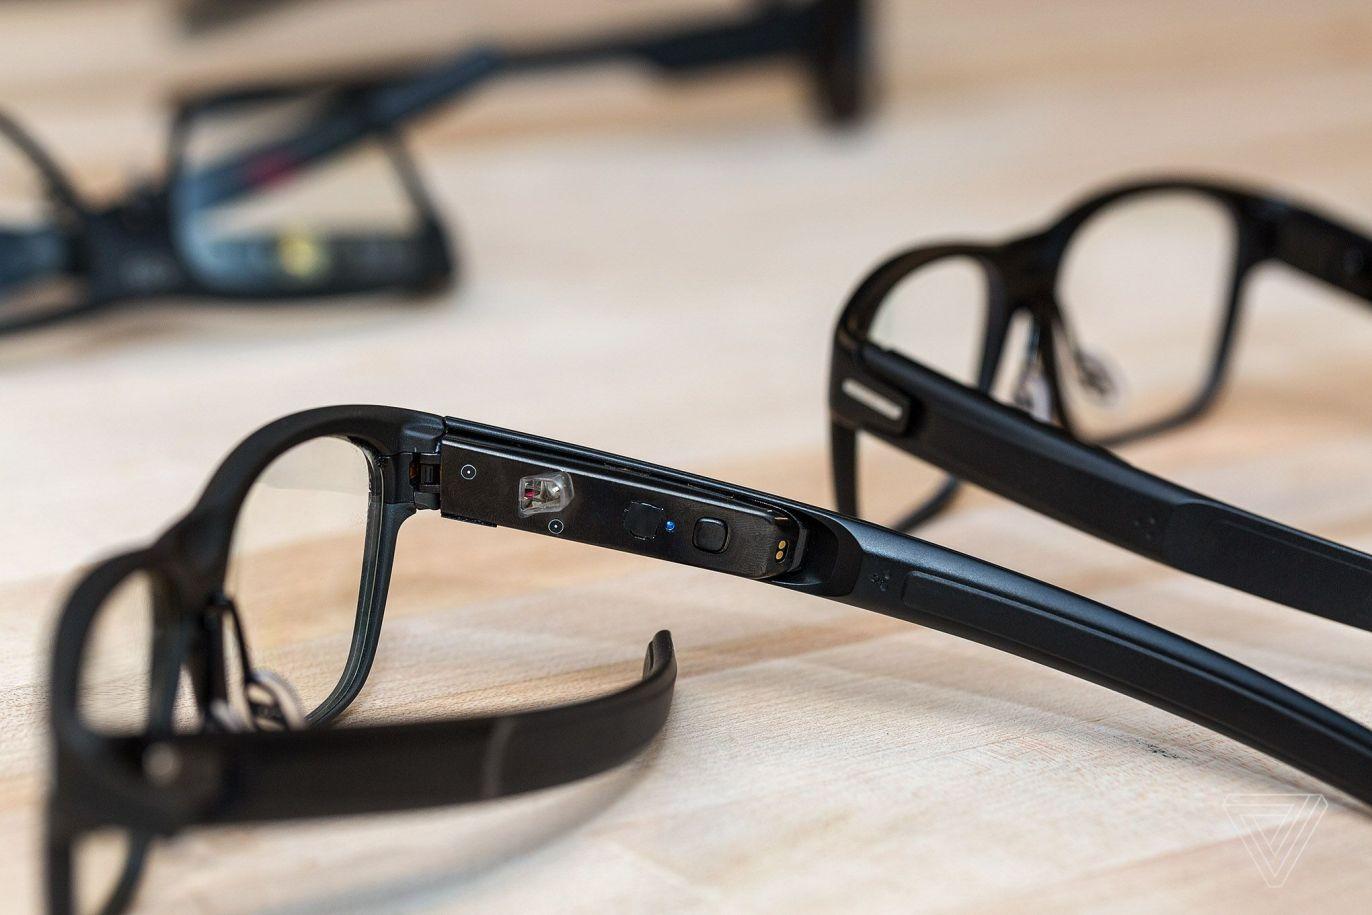 vaunt smart glasses by Intel